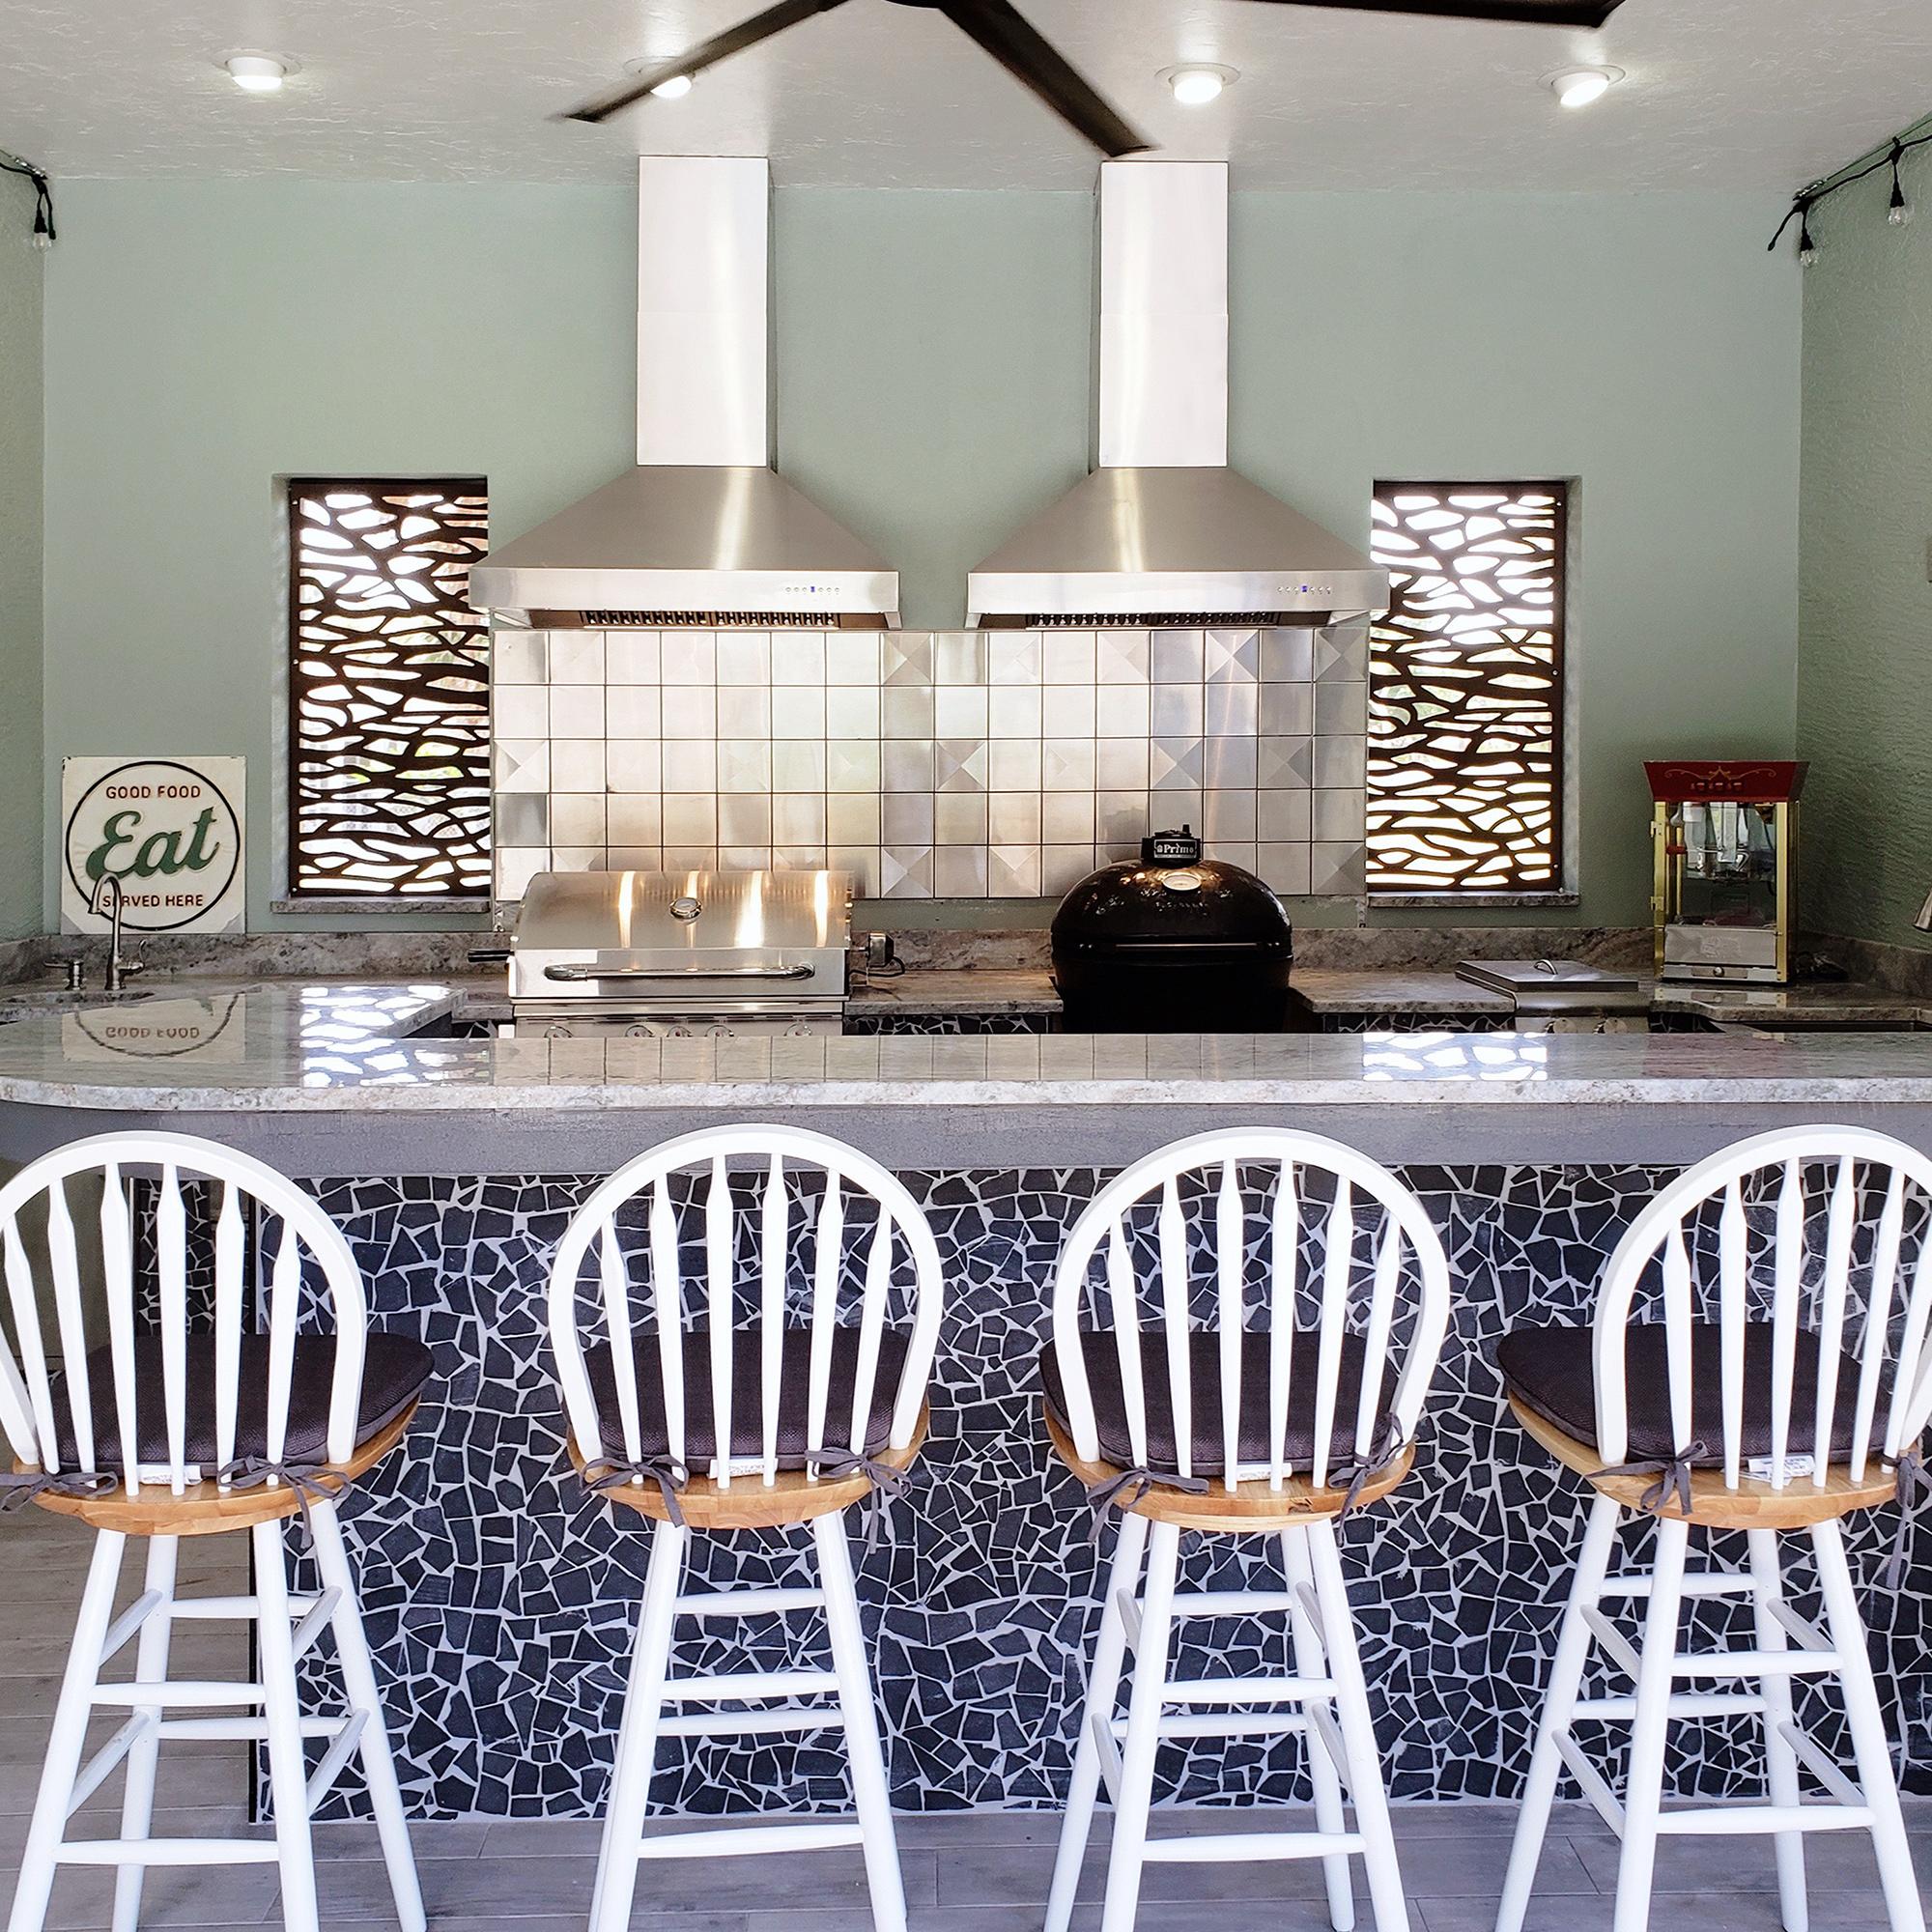 zline-stainless-steel-wall-mounted-range-hood-667-304-customer-kitchen-1 copy.jpg